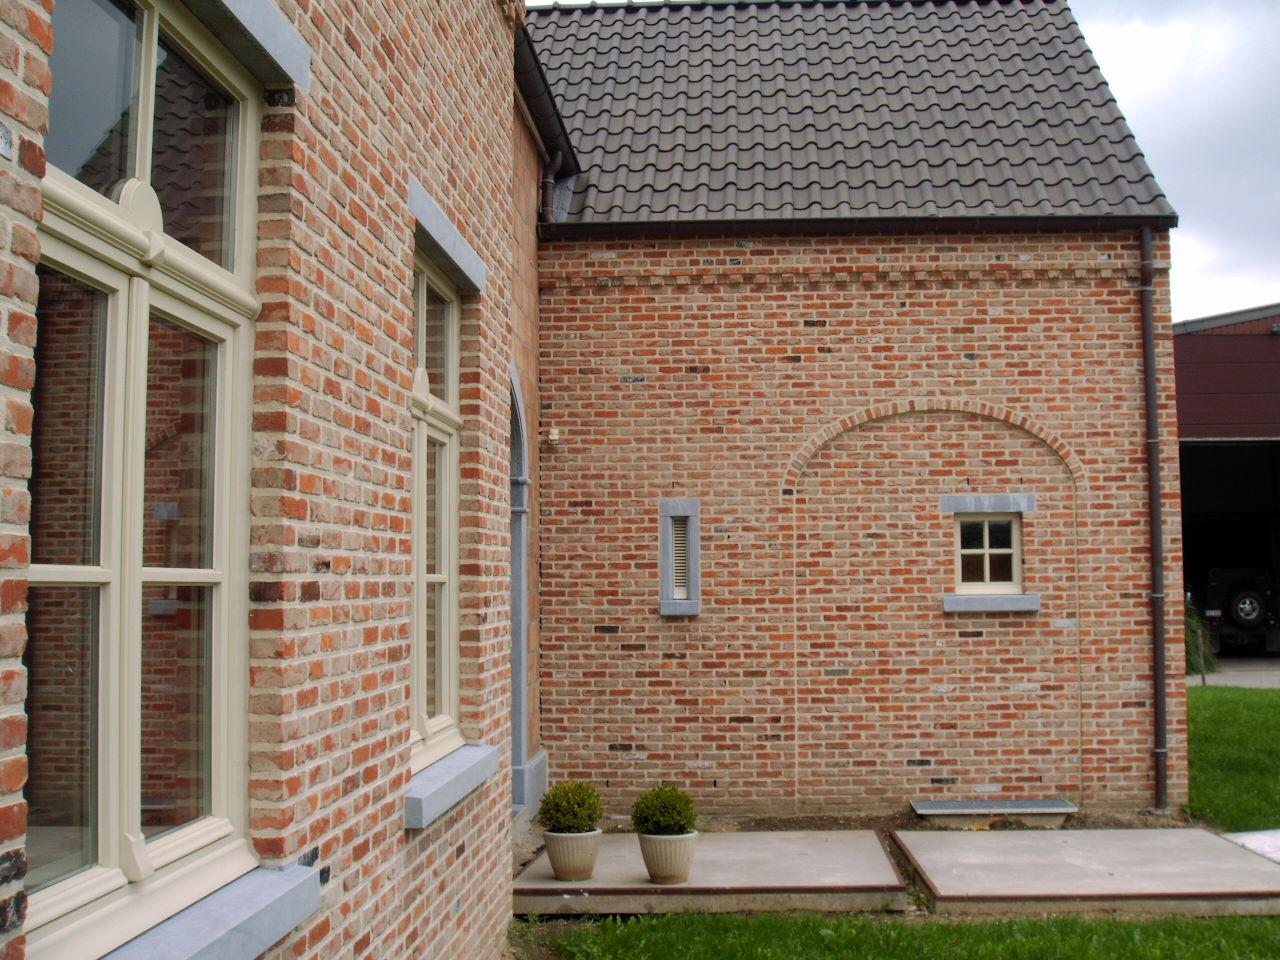 Nieuwbouw landelijke stijl Limburg